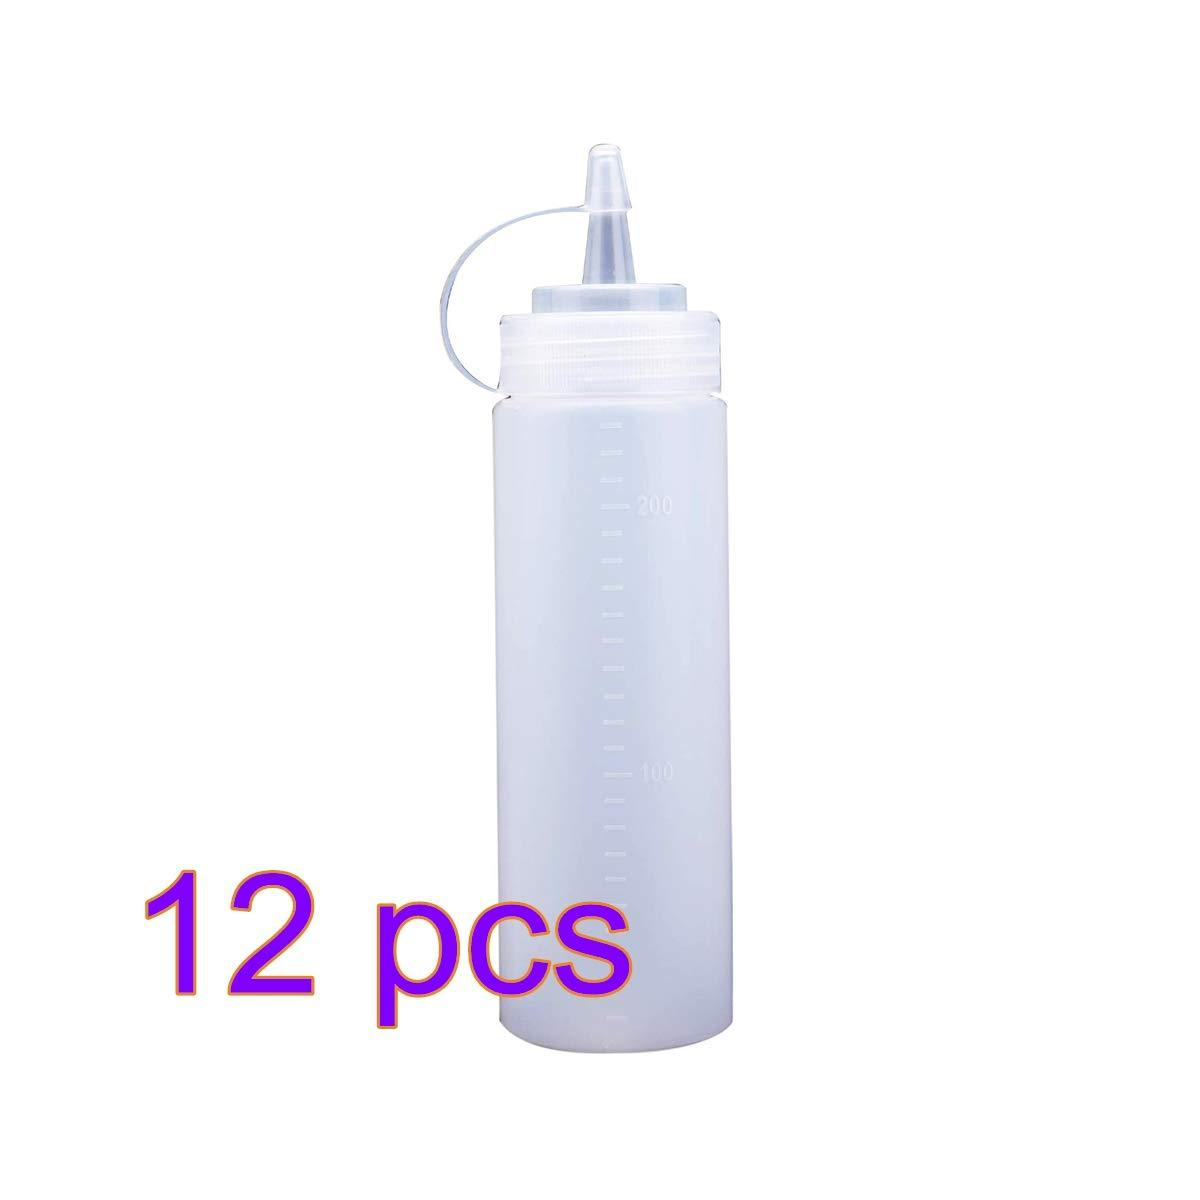 Plastic Squeeze Bottle Bulk Clear BPA Free Condiment Bulk Clear BPA Free Condiment Bottle Set Top Bottles Squirt Condiment Bottles (12Pcs)